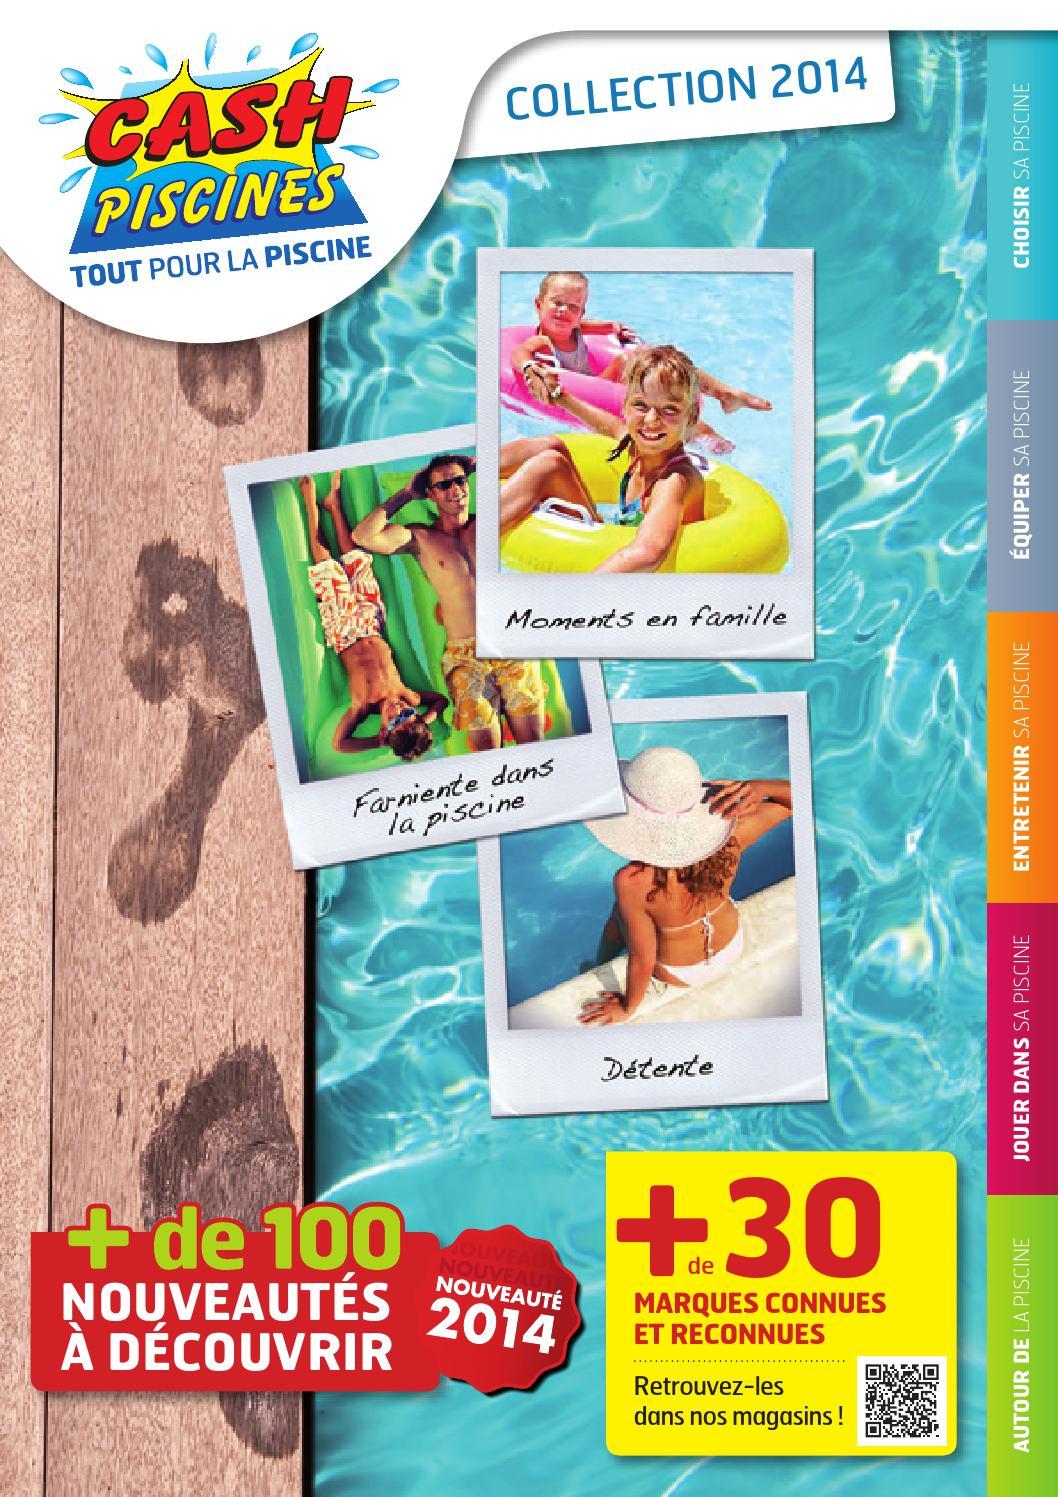 Cash Piscines Catalogue 2014 By Octave Octave - Issuu avec Cash Piscine Montauban